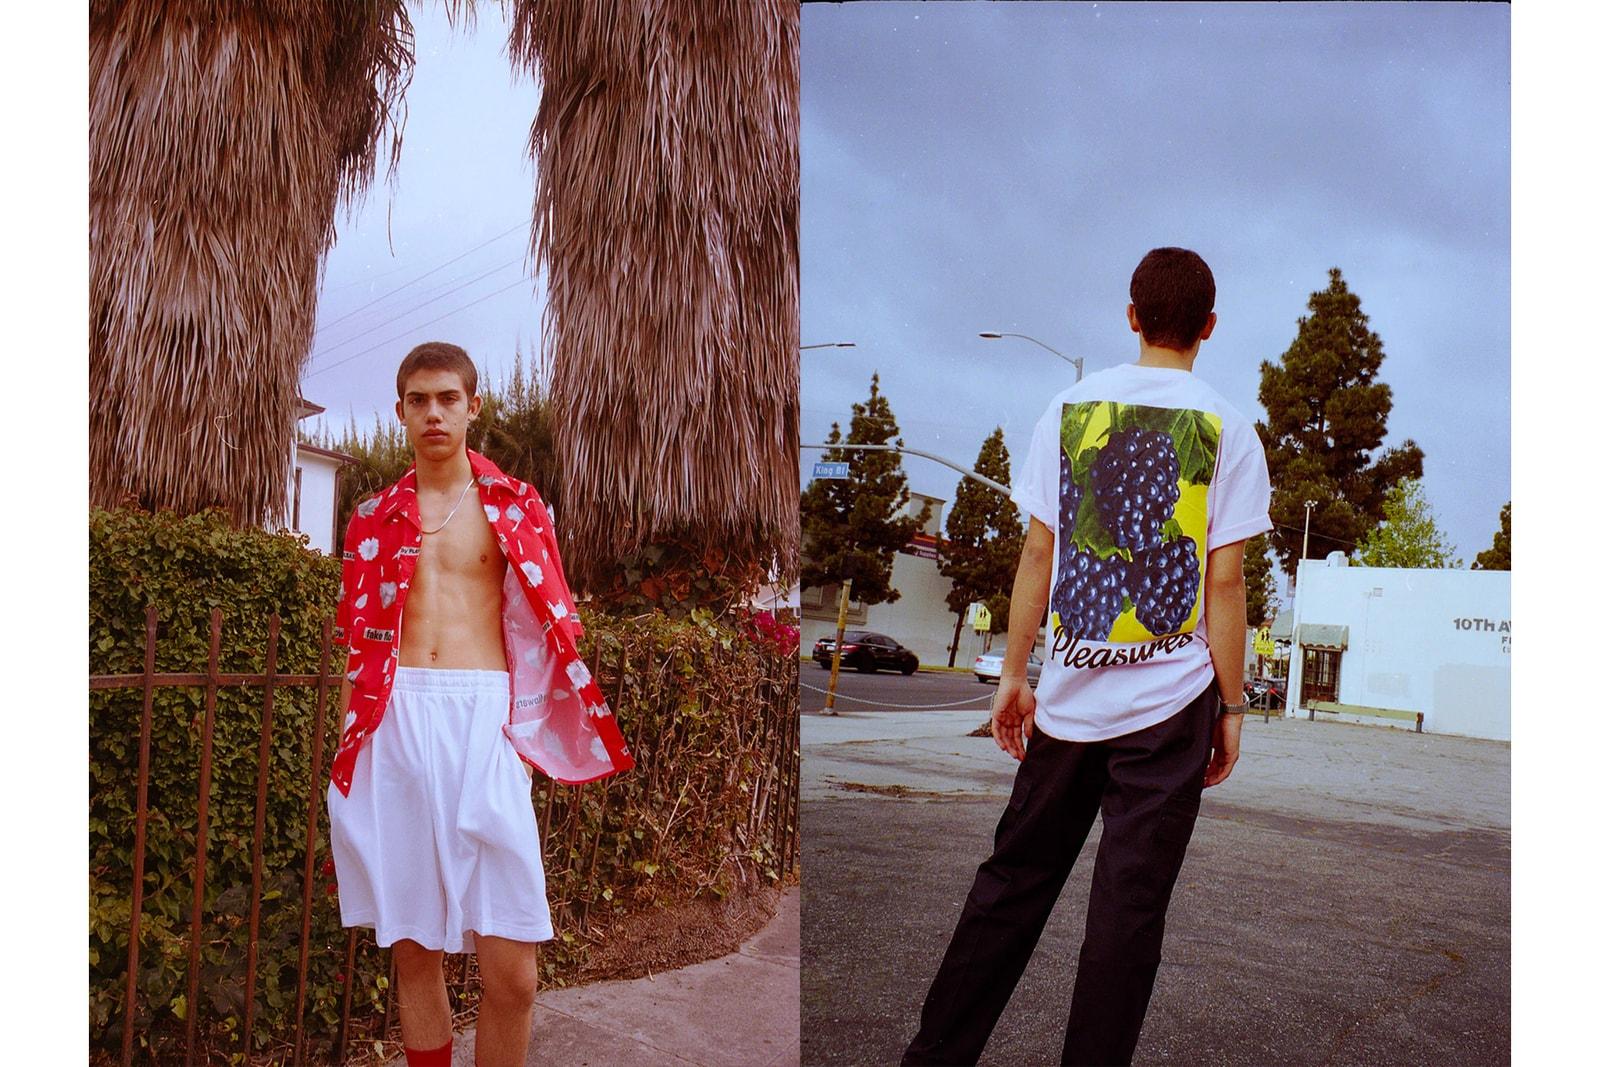 Supreme Spring/Summer 2018 Drop 15 Release Info supreme tivoli speakers playboy palace bape nike acg Parra streetwear